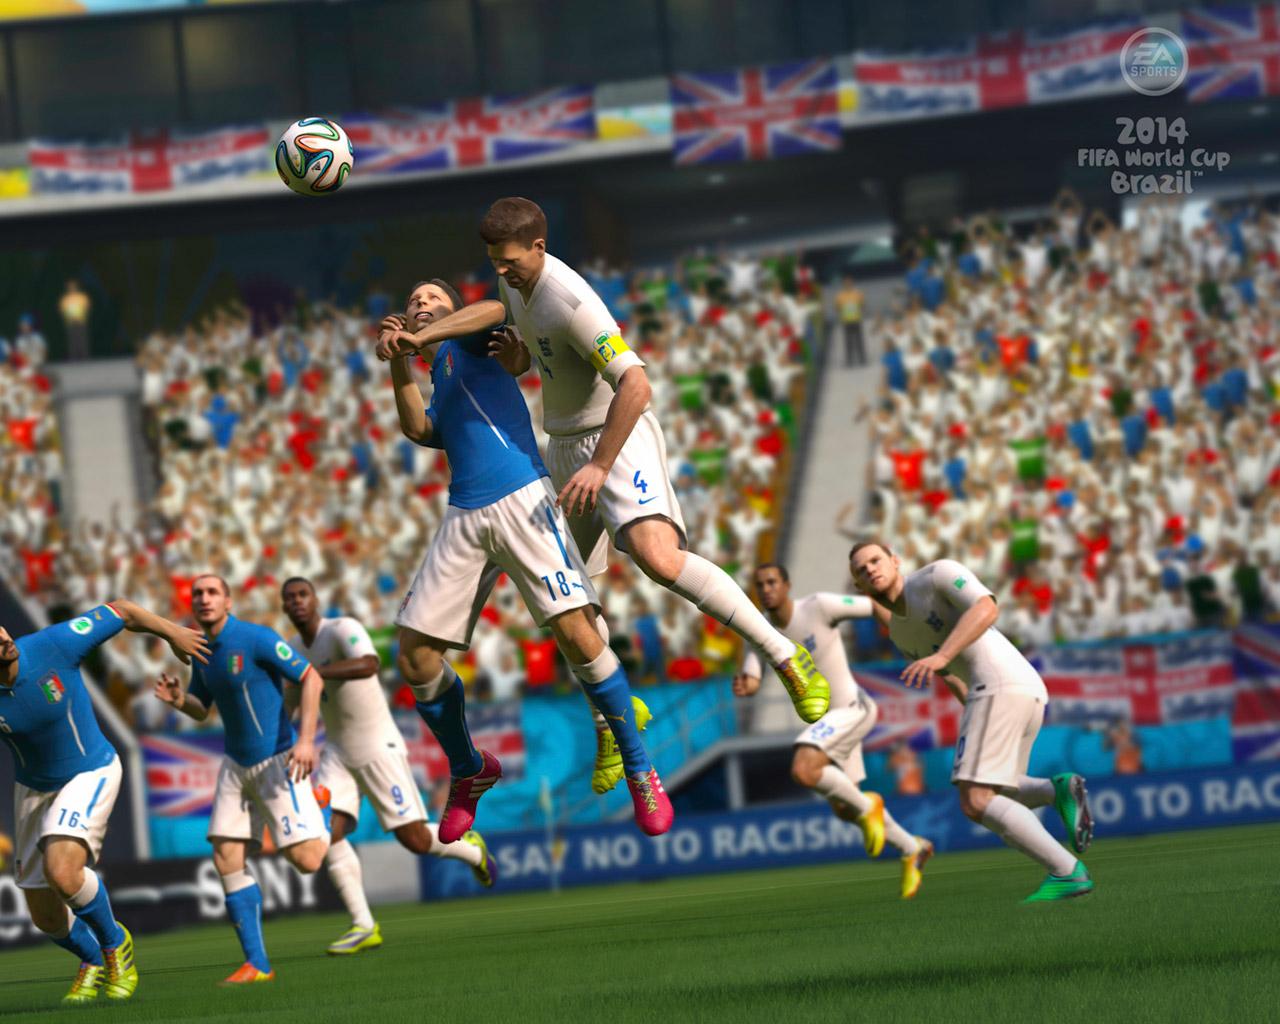 Free 2014 FIFA World Cup Brazil Wallpaper in 1280x1024